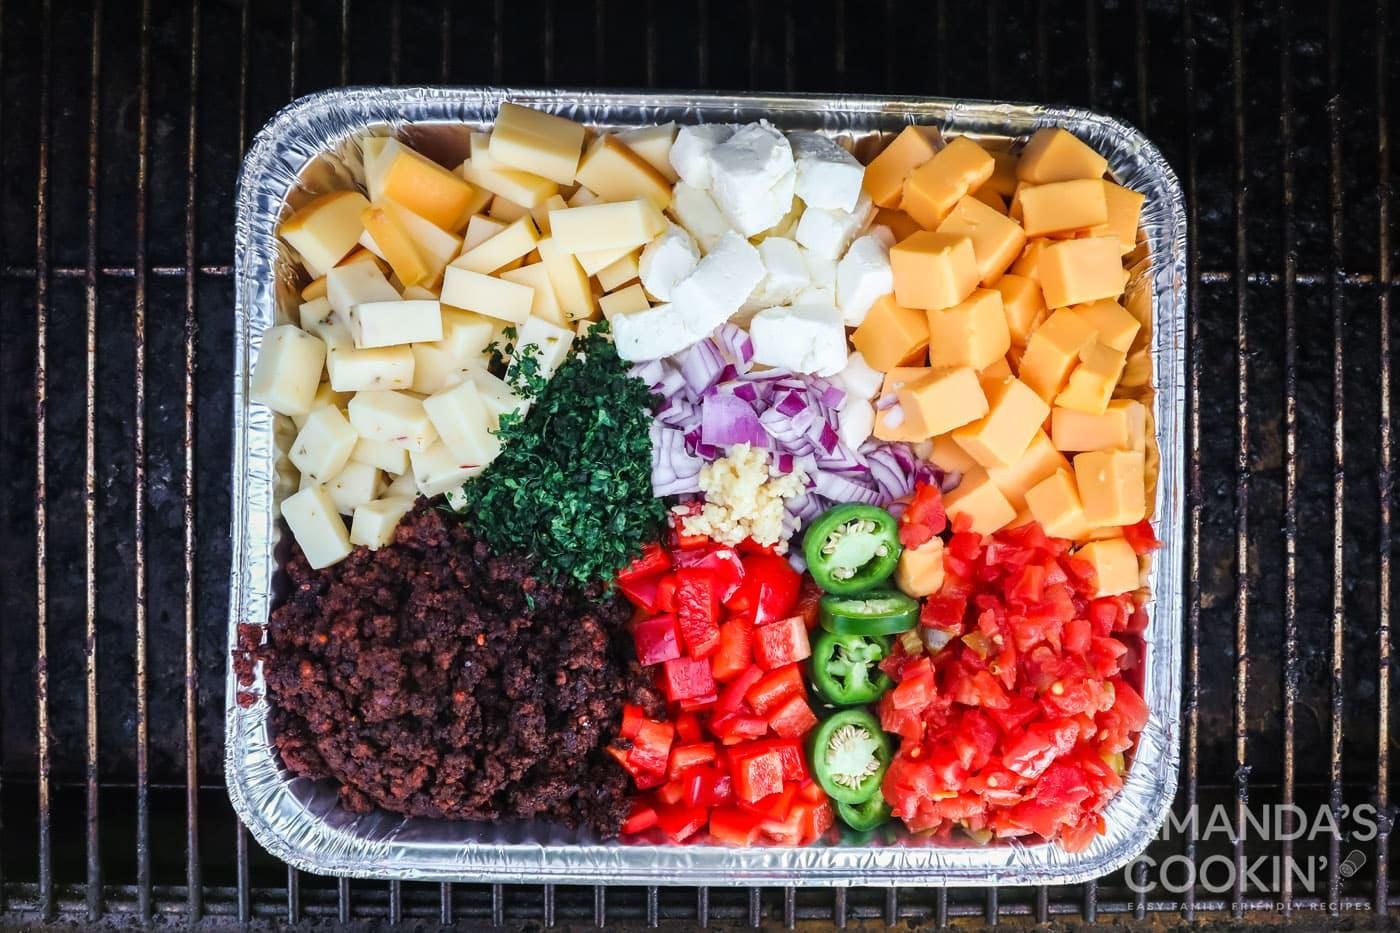 queso dip ingredients in a 13x9 foil pan